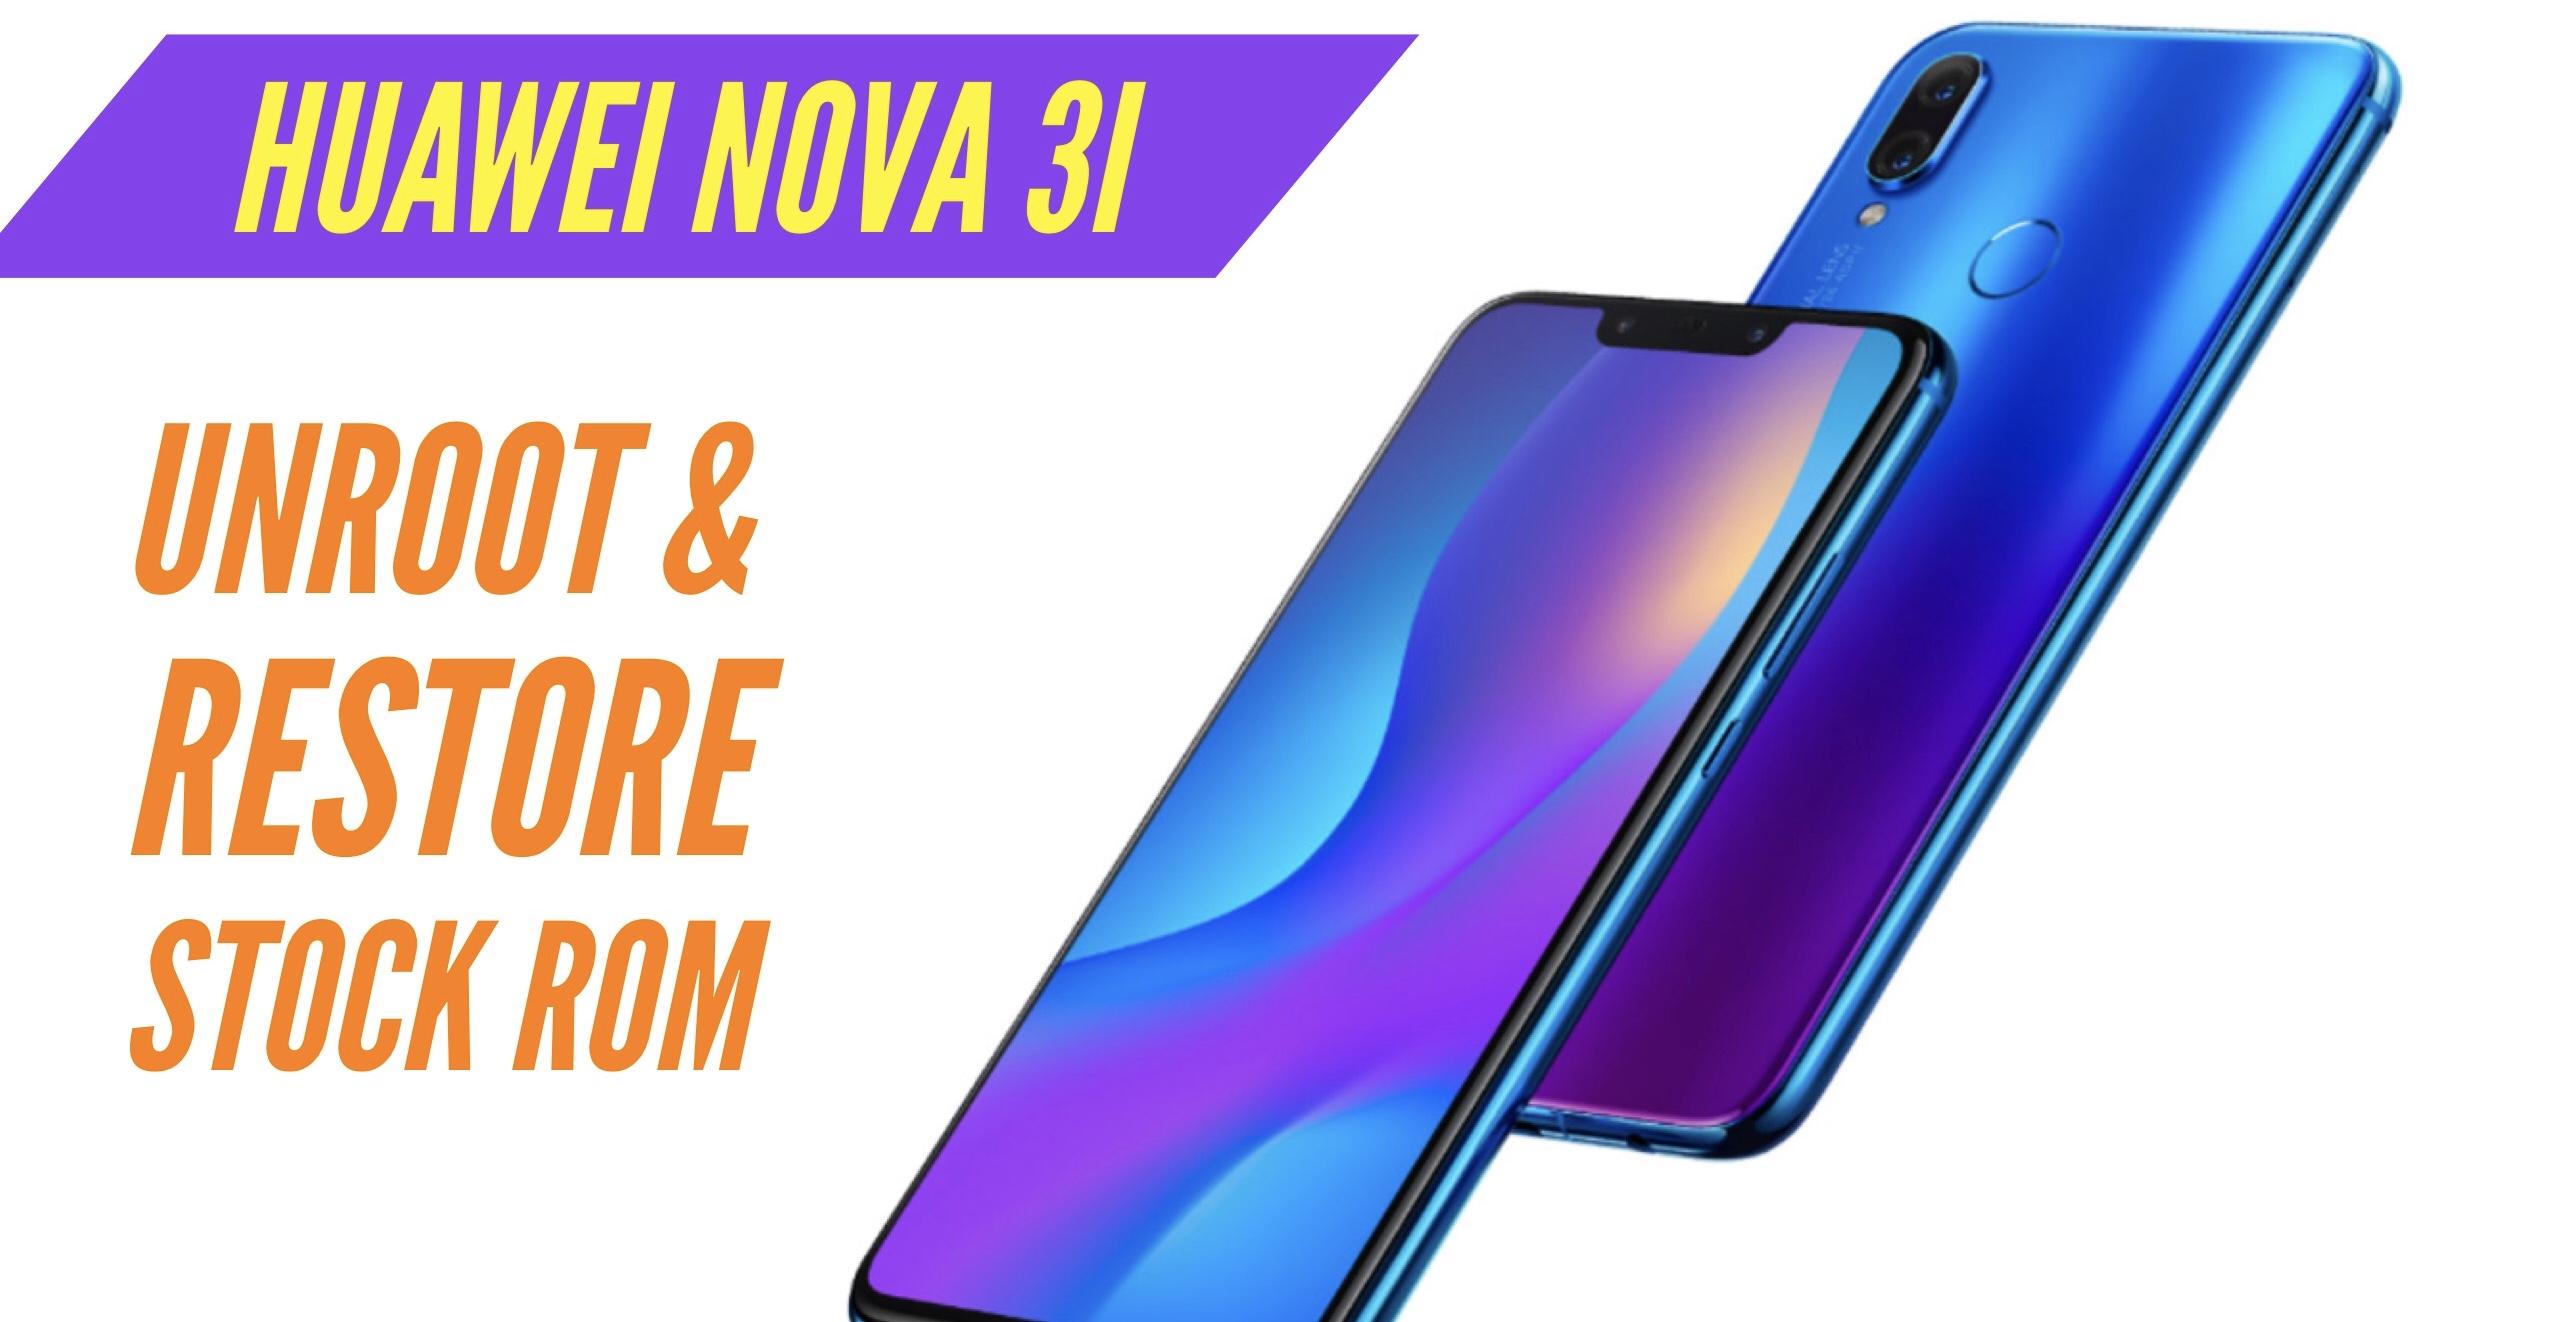 How to Unroot Huawei Nova 3i & Restore Stock ROM? INSTALL!